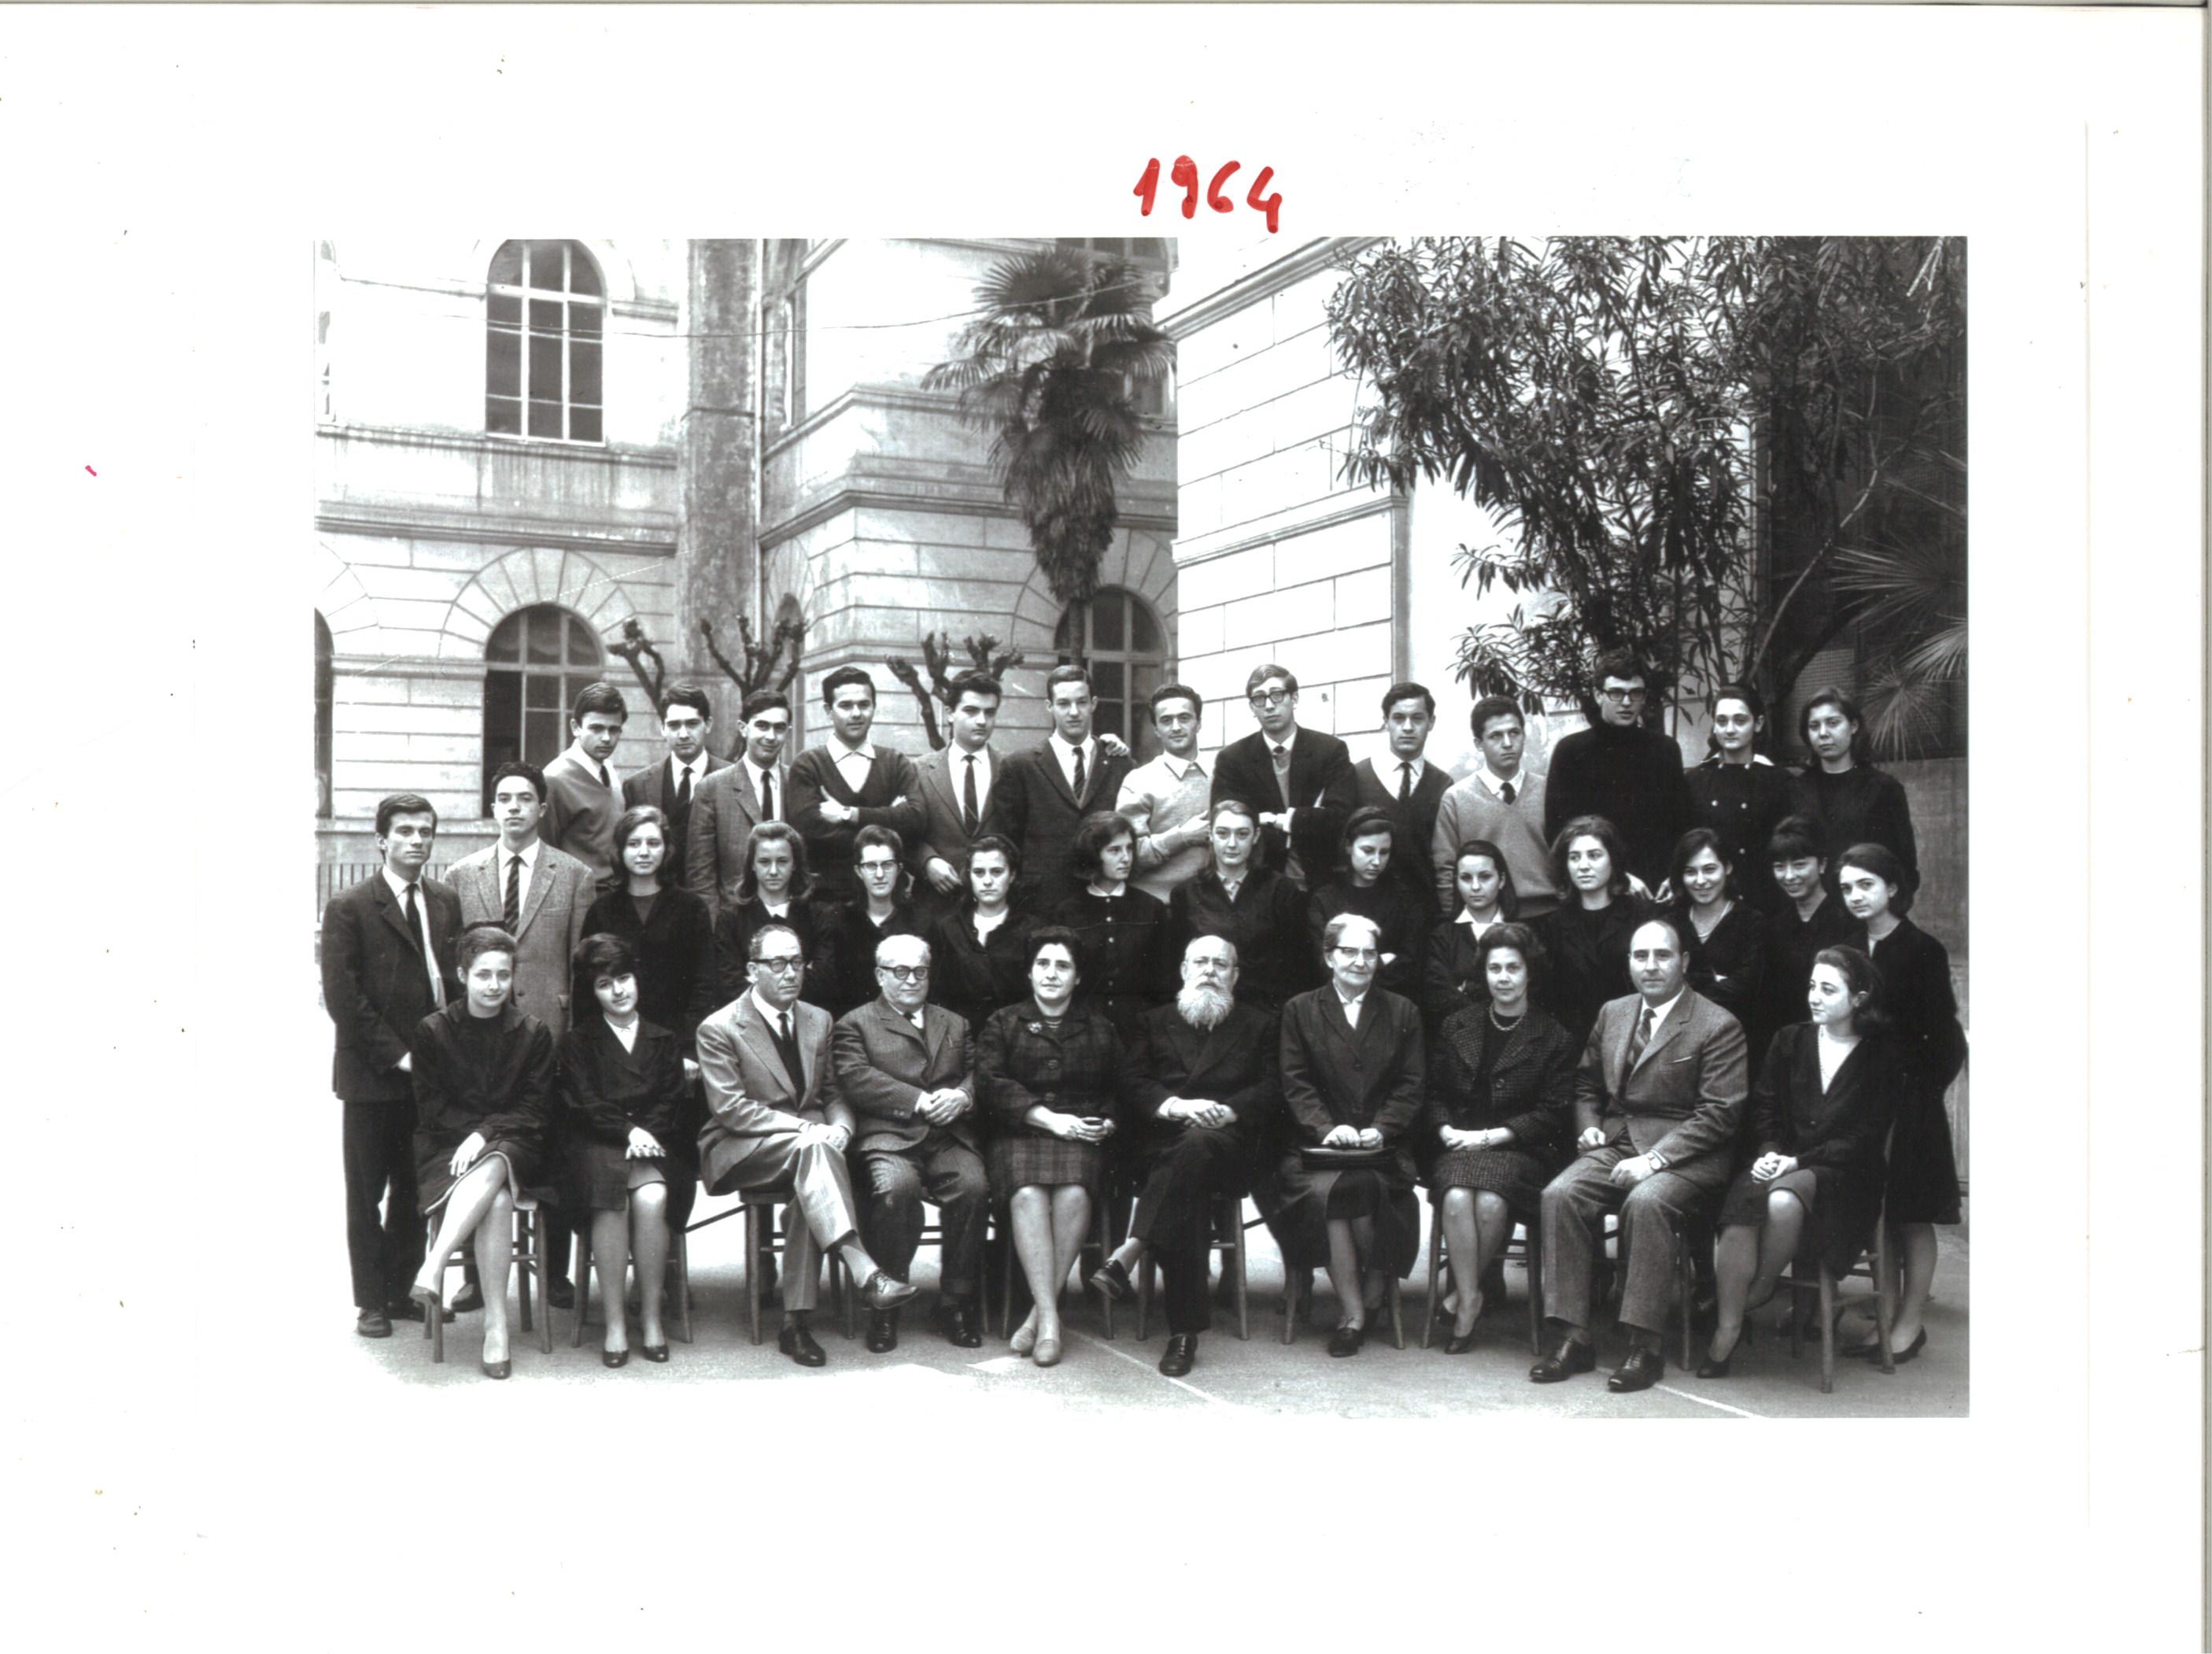 1964 (1)